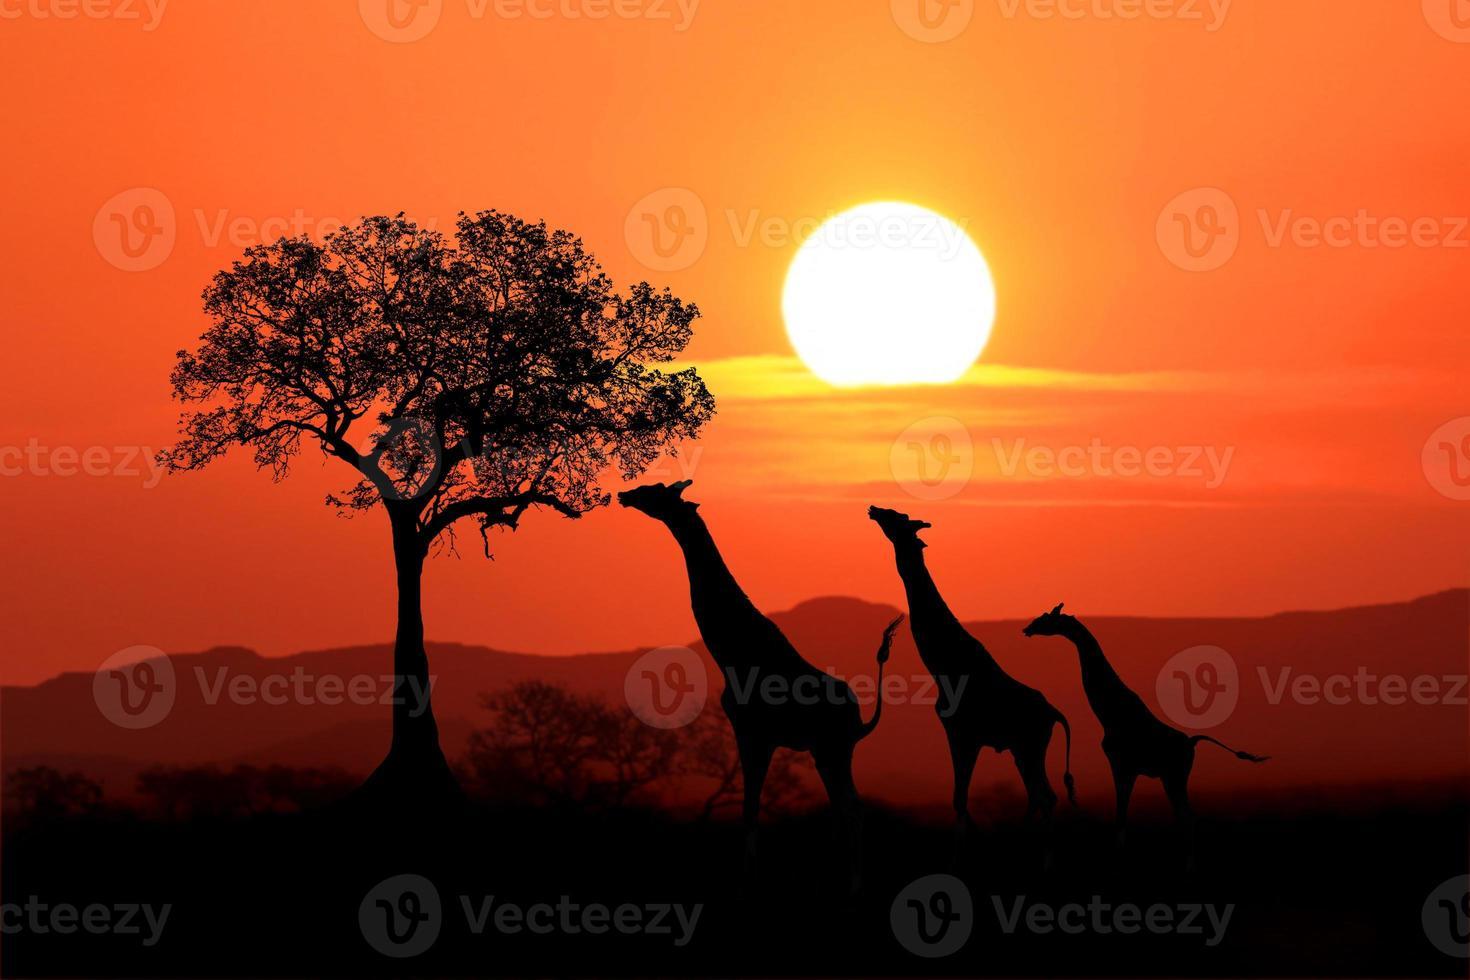 grandi giraffe sudafricane al tramonto in africa foto